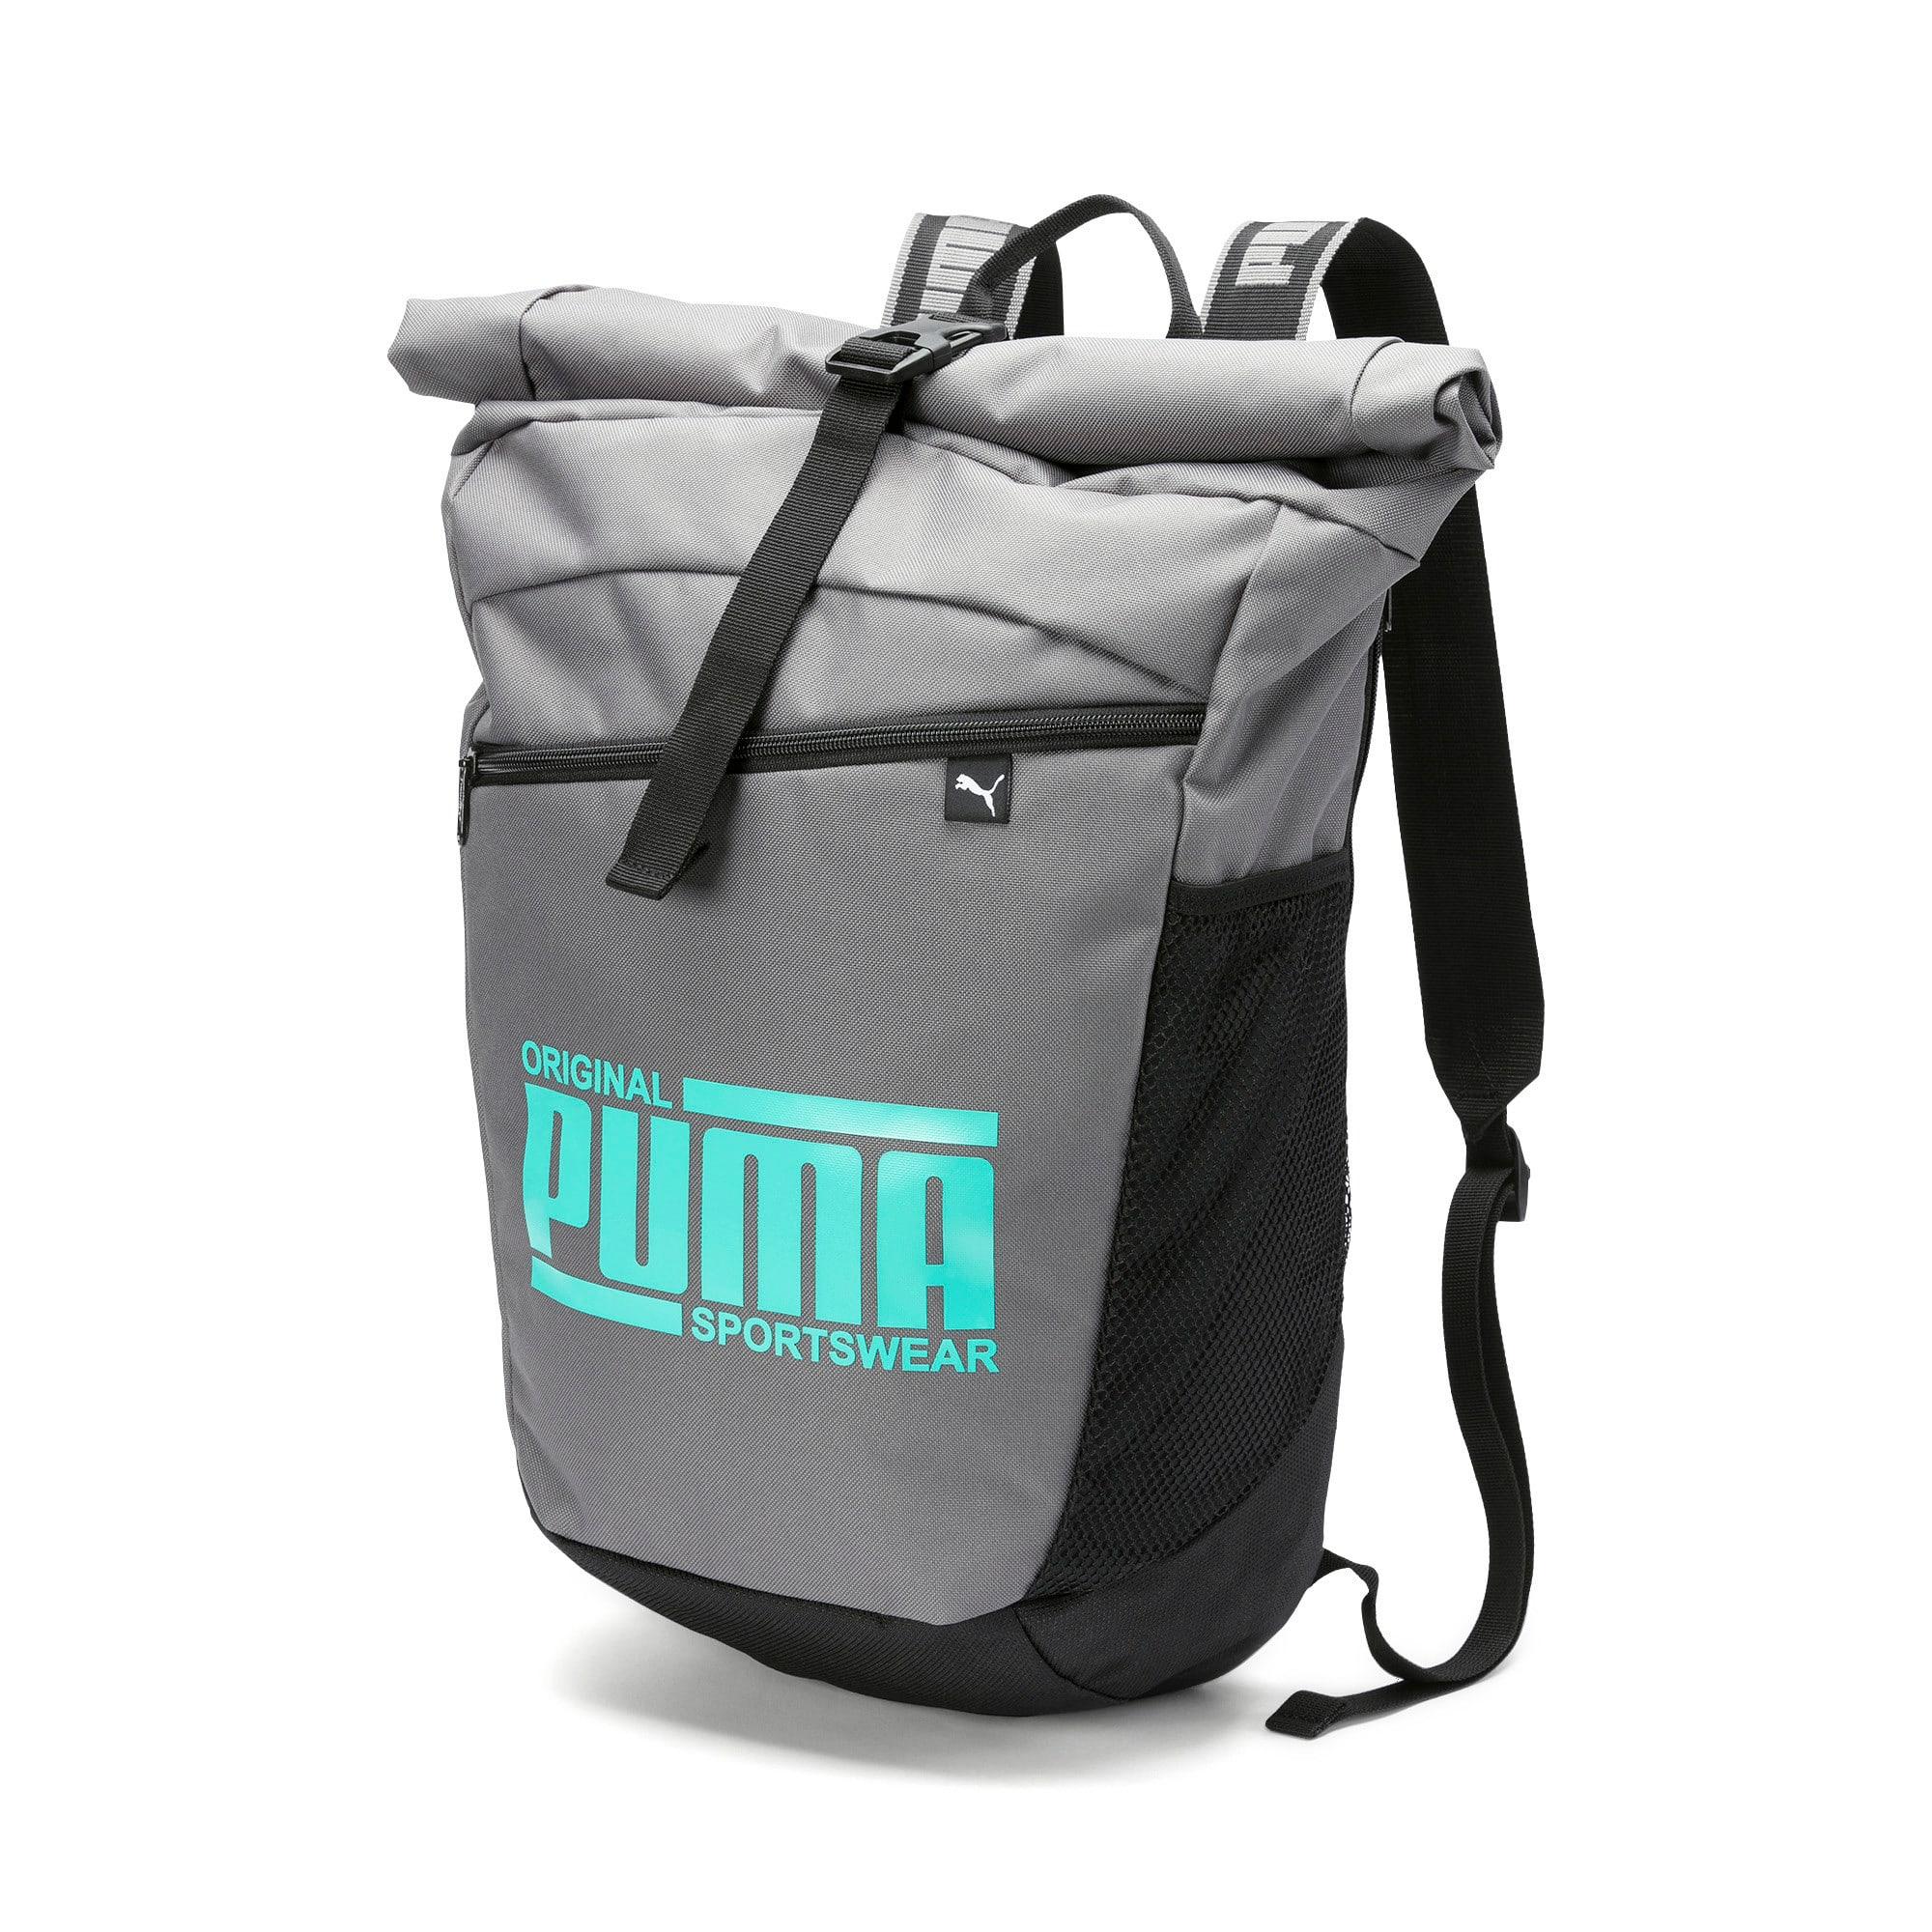 Thumbnail 1 of Sole Backpack, CASTLEROCK, medium